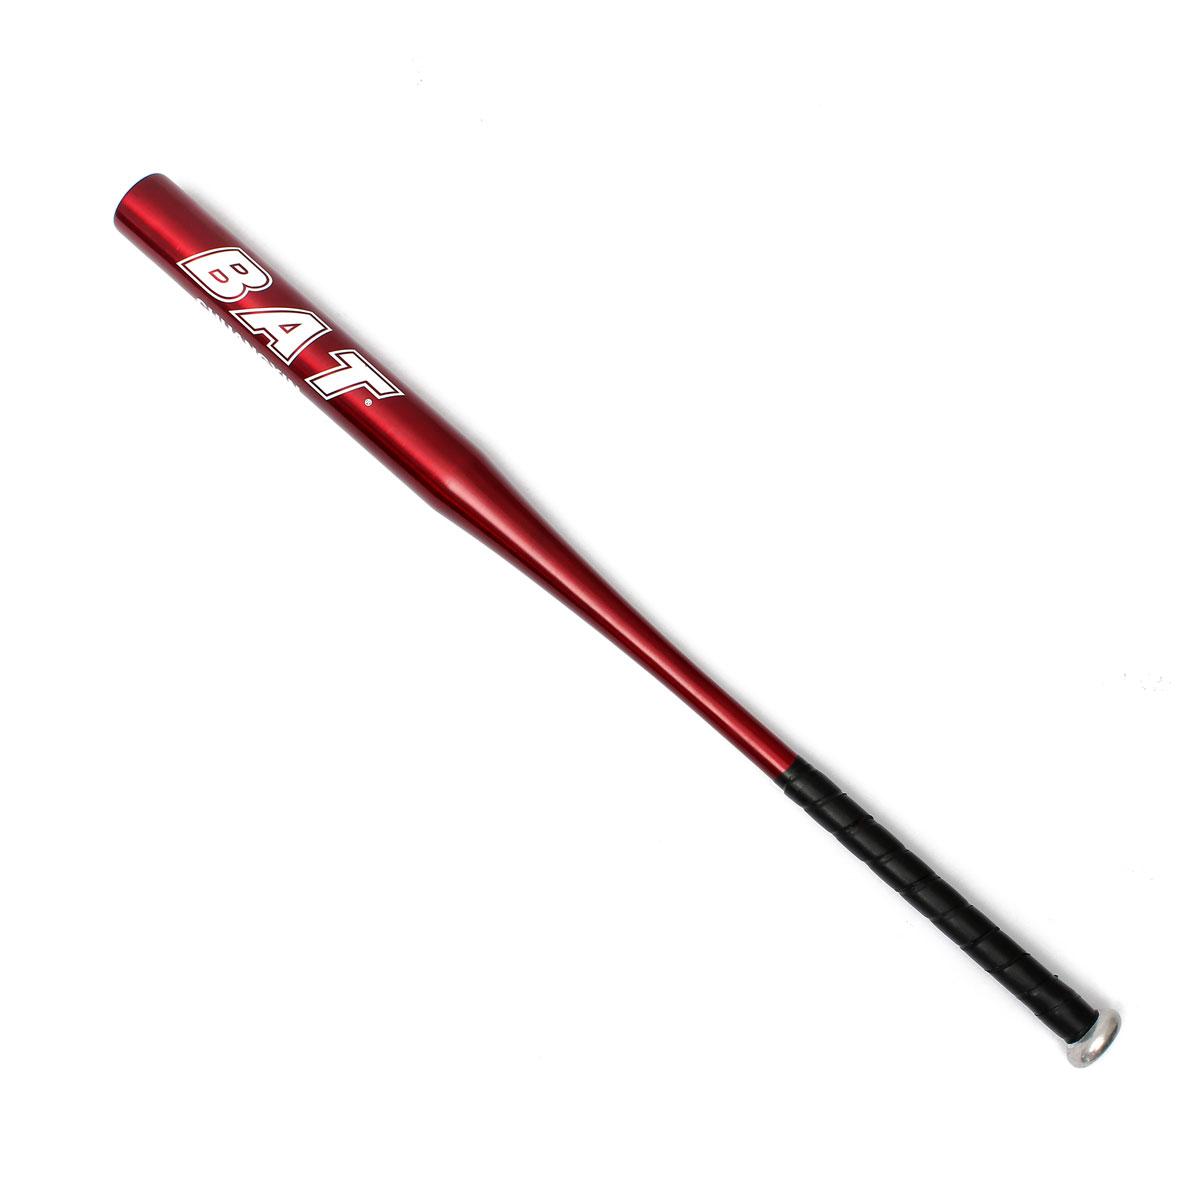 Rules Of Squash as well Metal Baseball Bats in addition Raqueta Badminton Artengo Br710 Id 8353227 furthermore Perforated Plastic Balls additionally Xxsrj. on softball racket